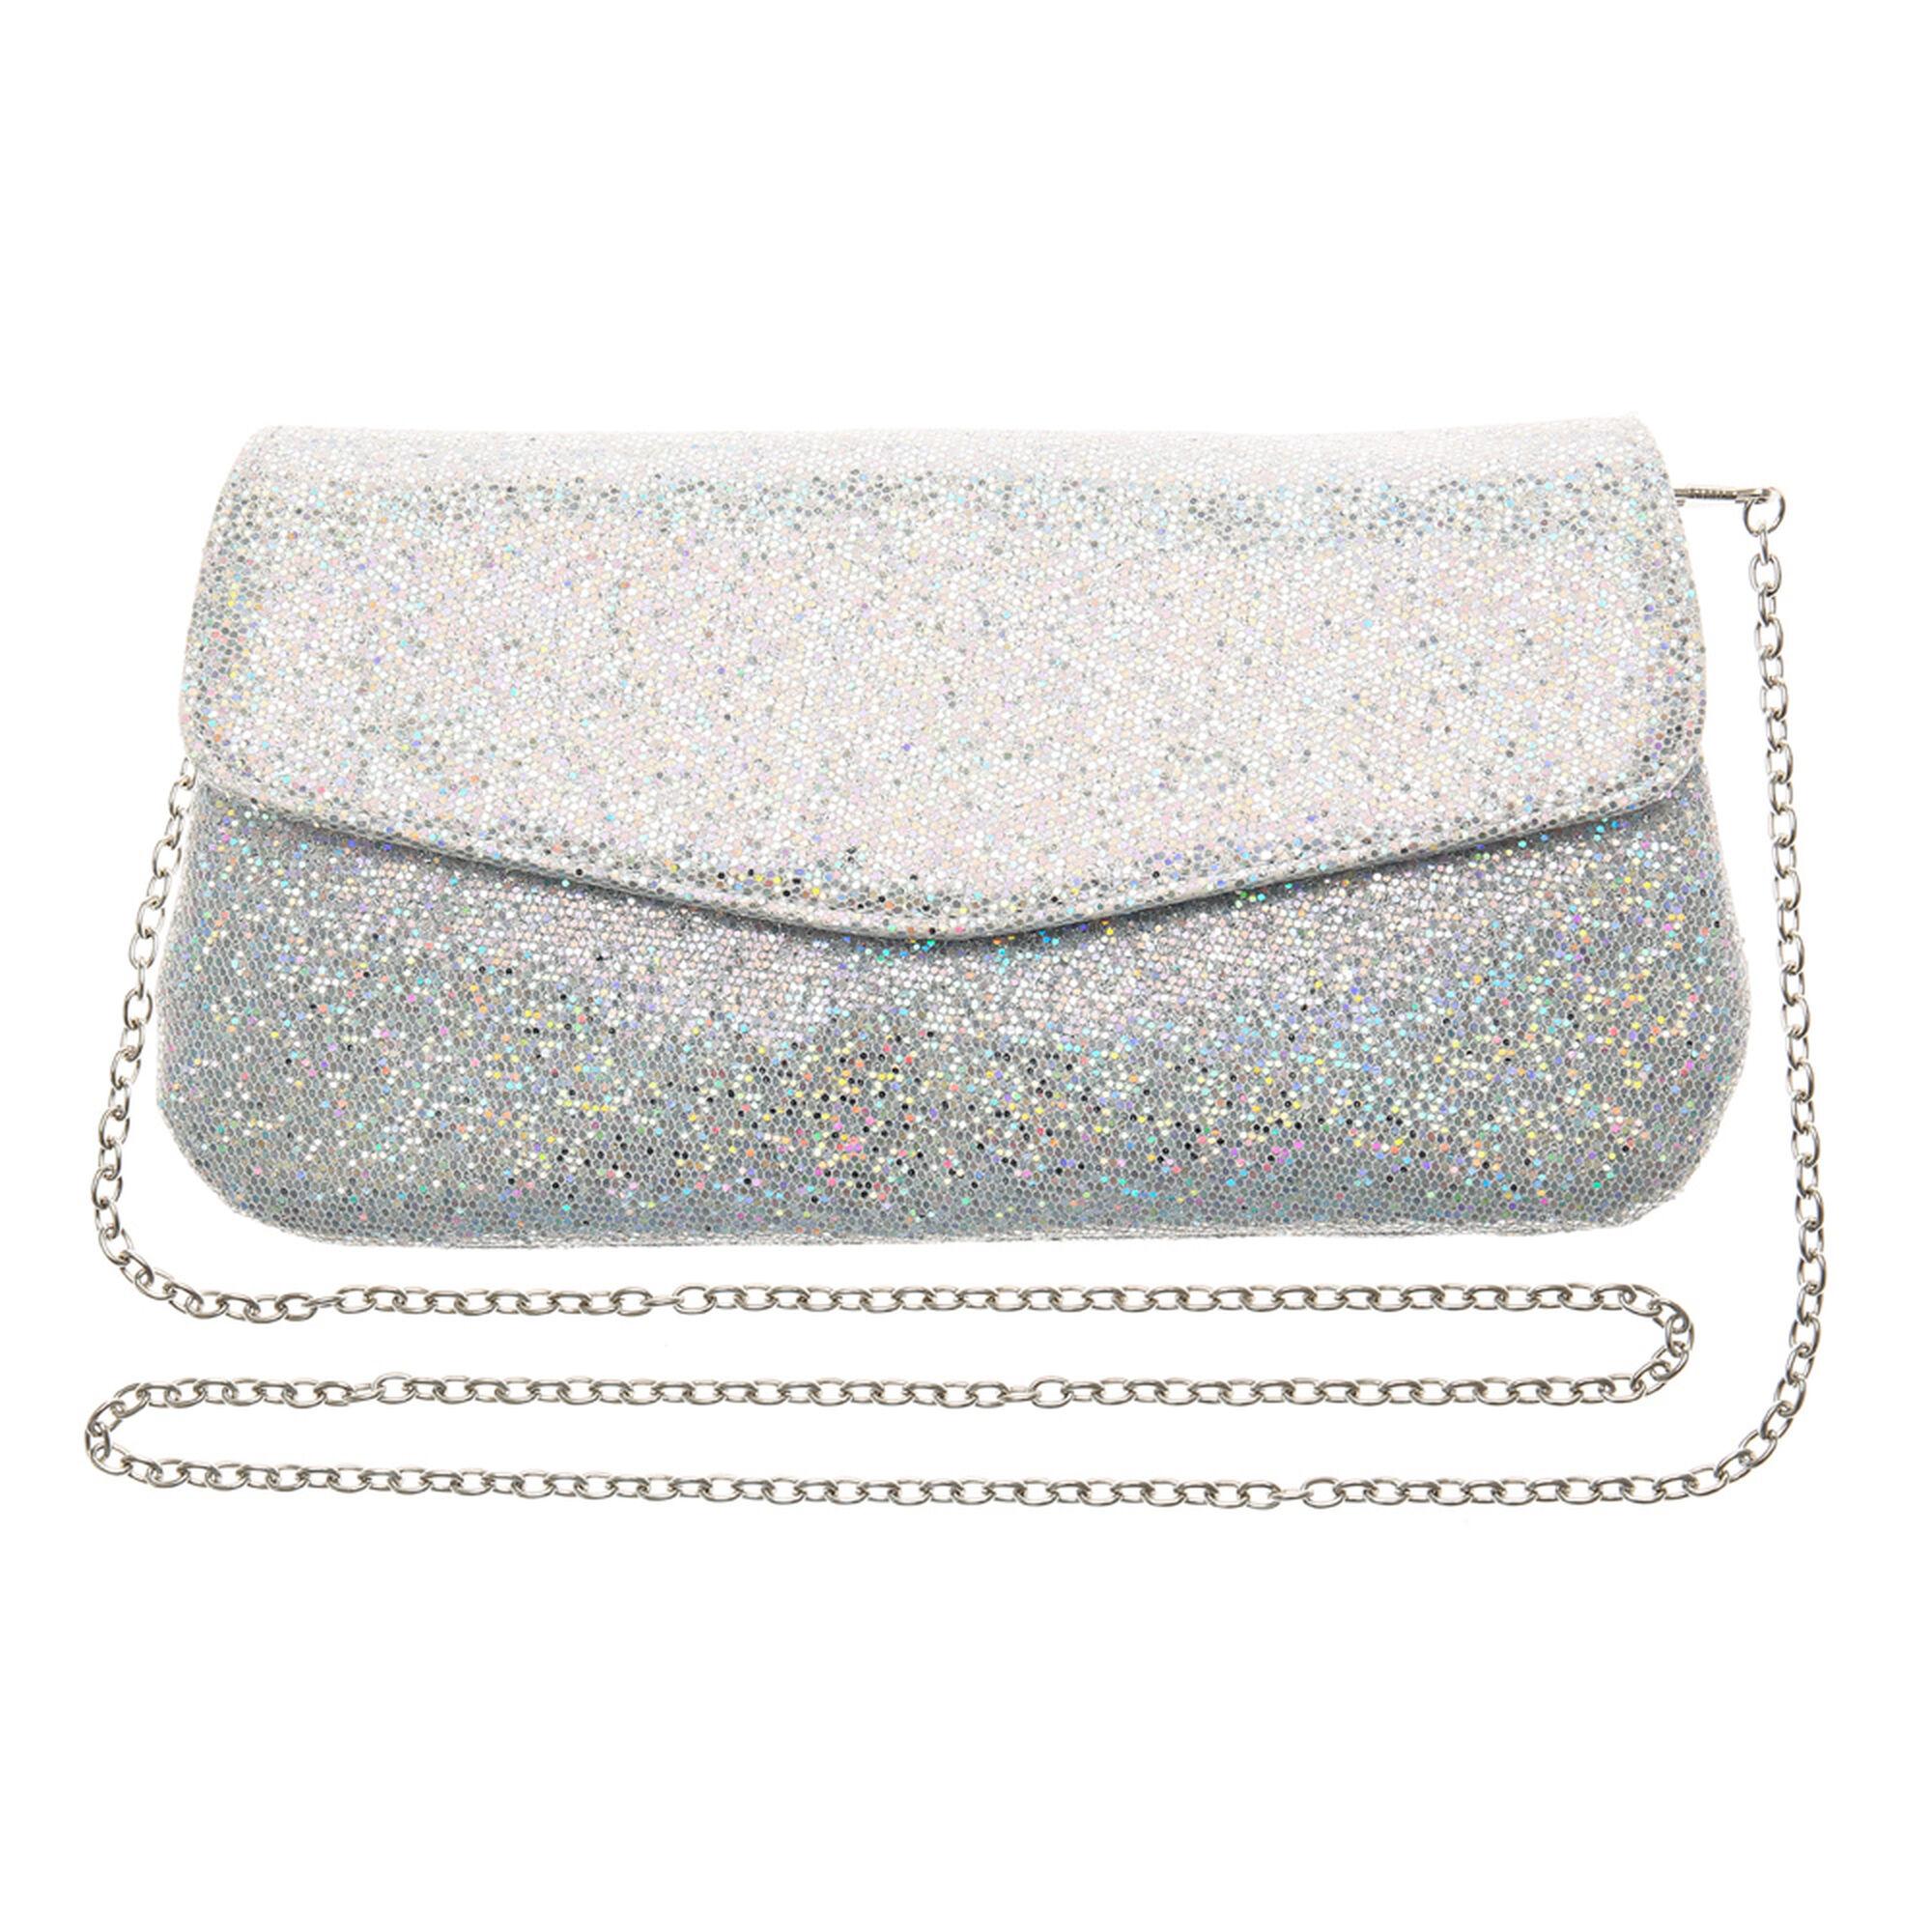 Sparkling Silver Silvers: Silver Glitter Clutch